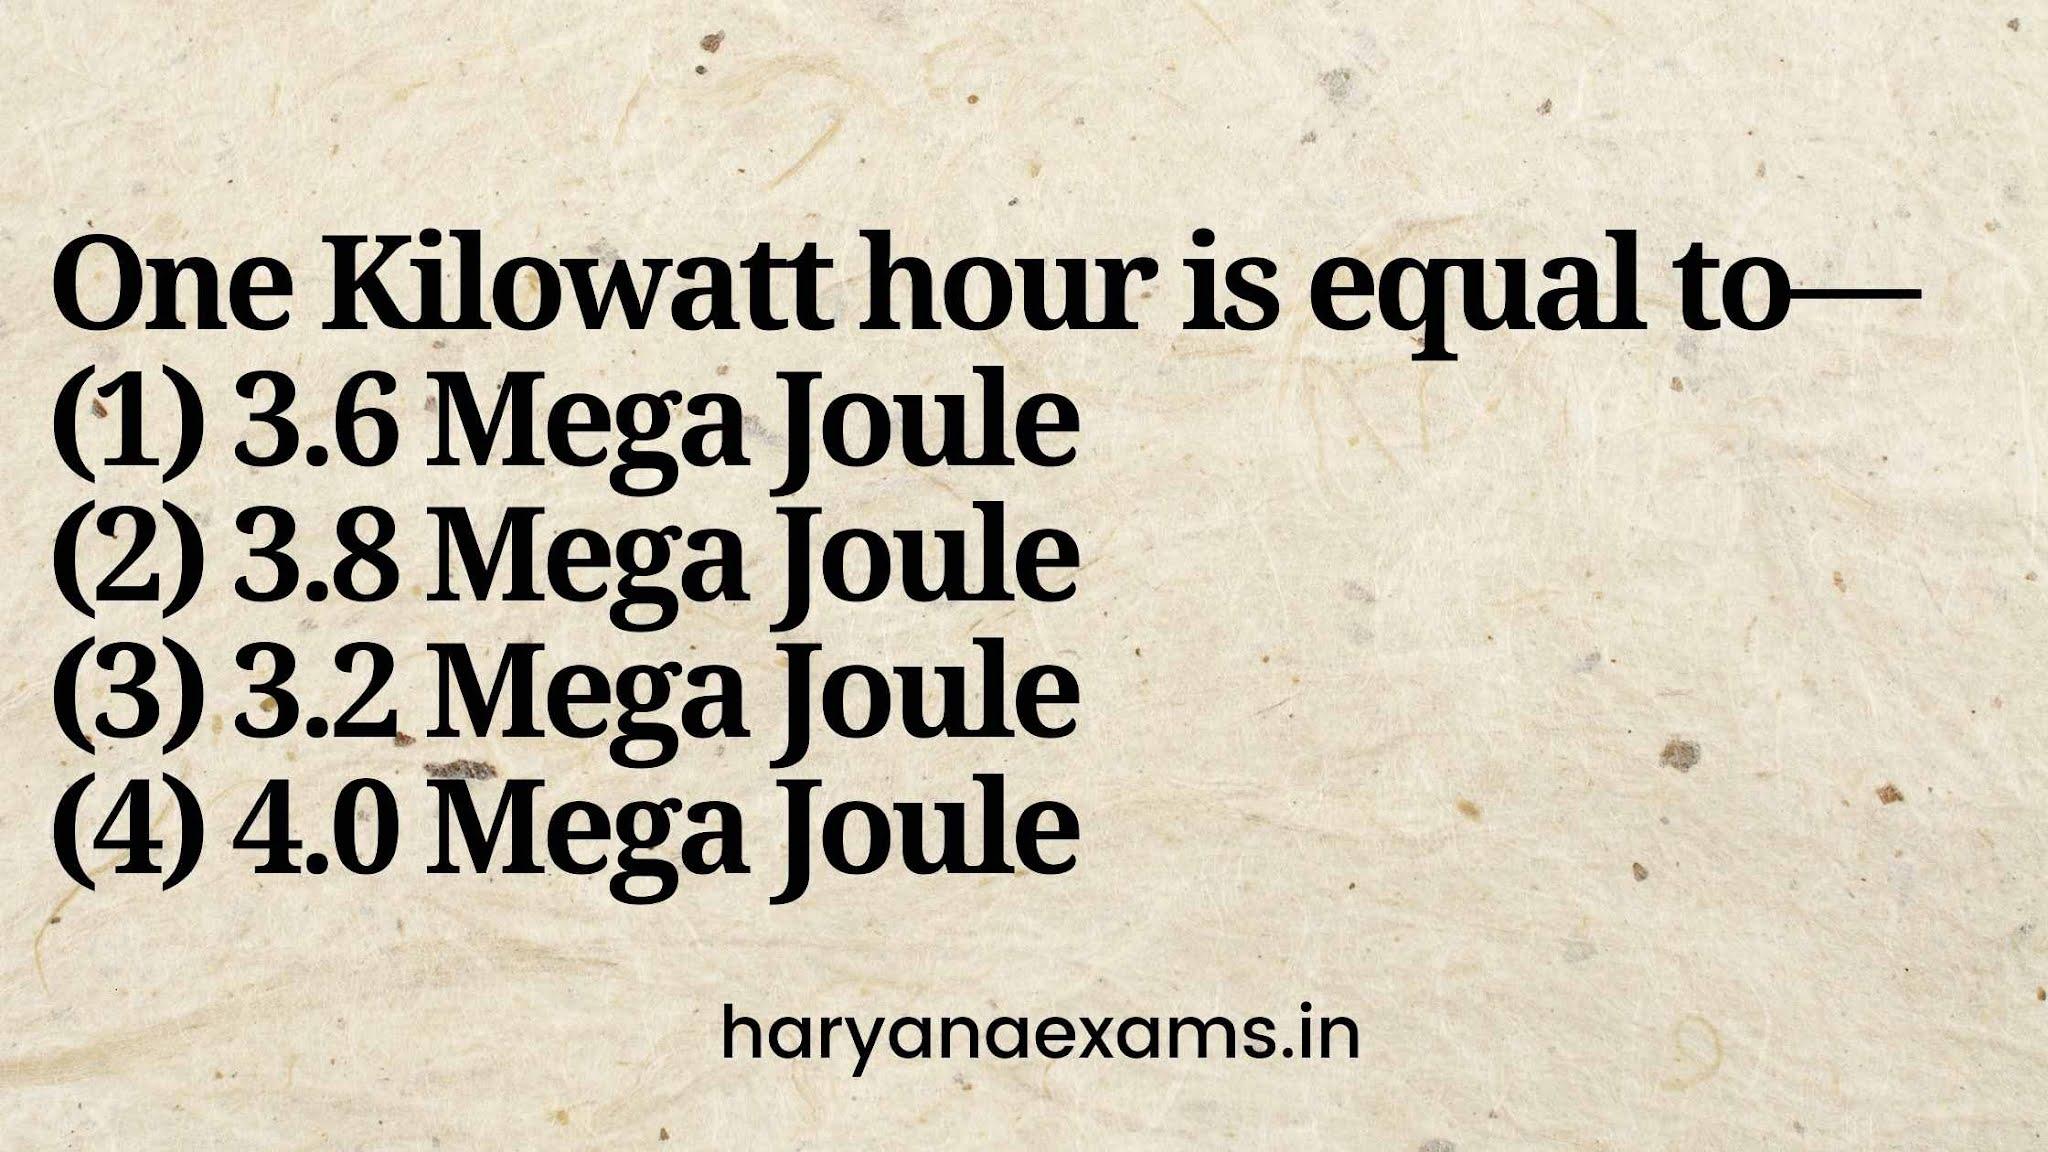 One Kilowatt hour is equal to—   (1) 3.6 Mega Joule   (2) 3.8 Mega Joule   (3) 3.2 Mega Joule   (4) 4.0 Mega Joule